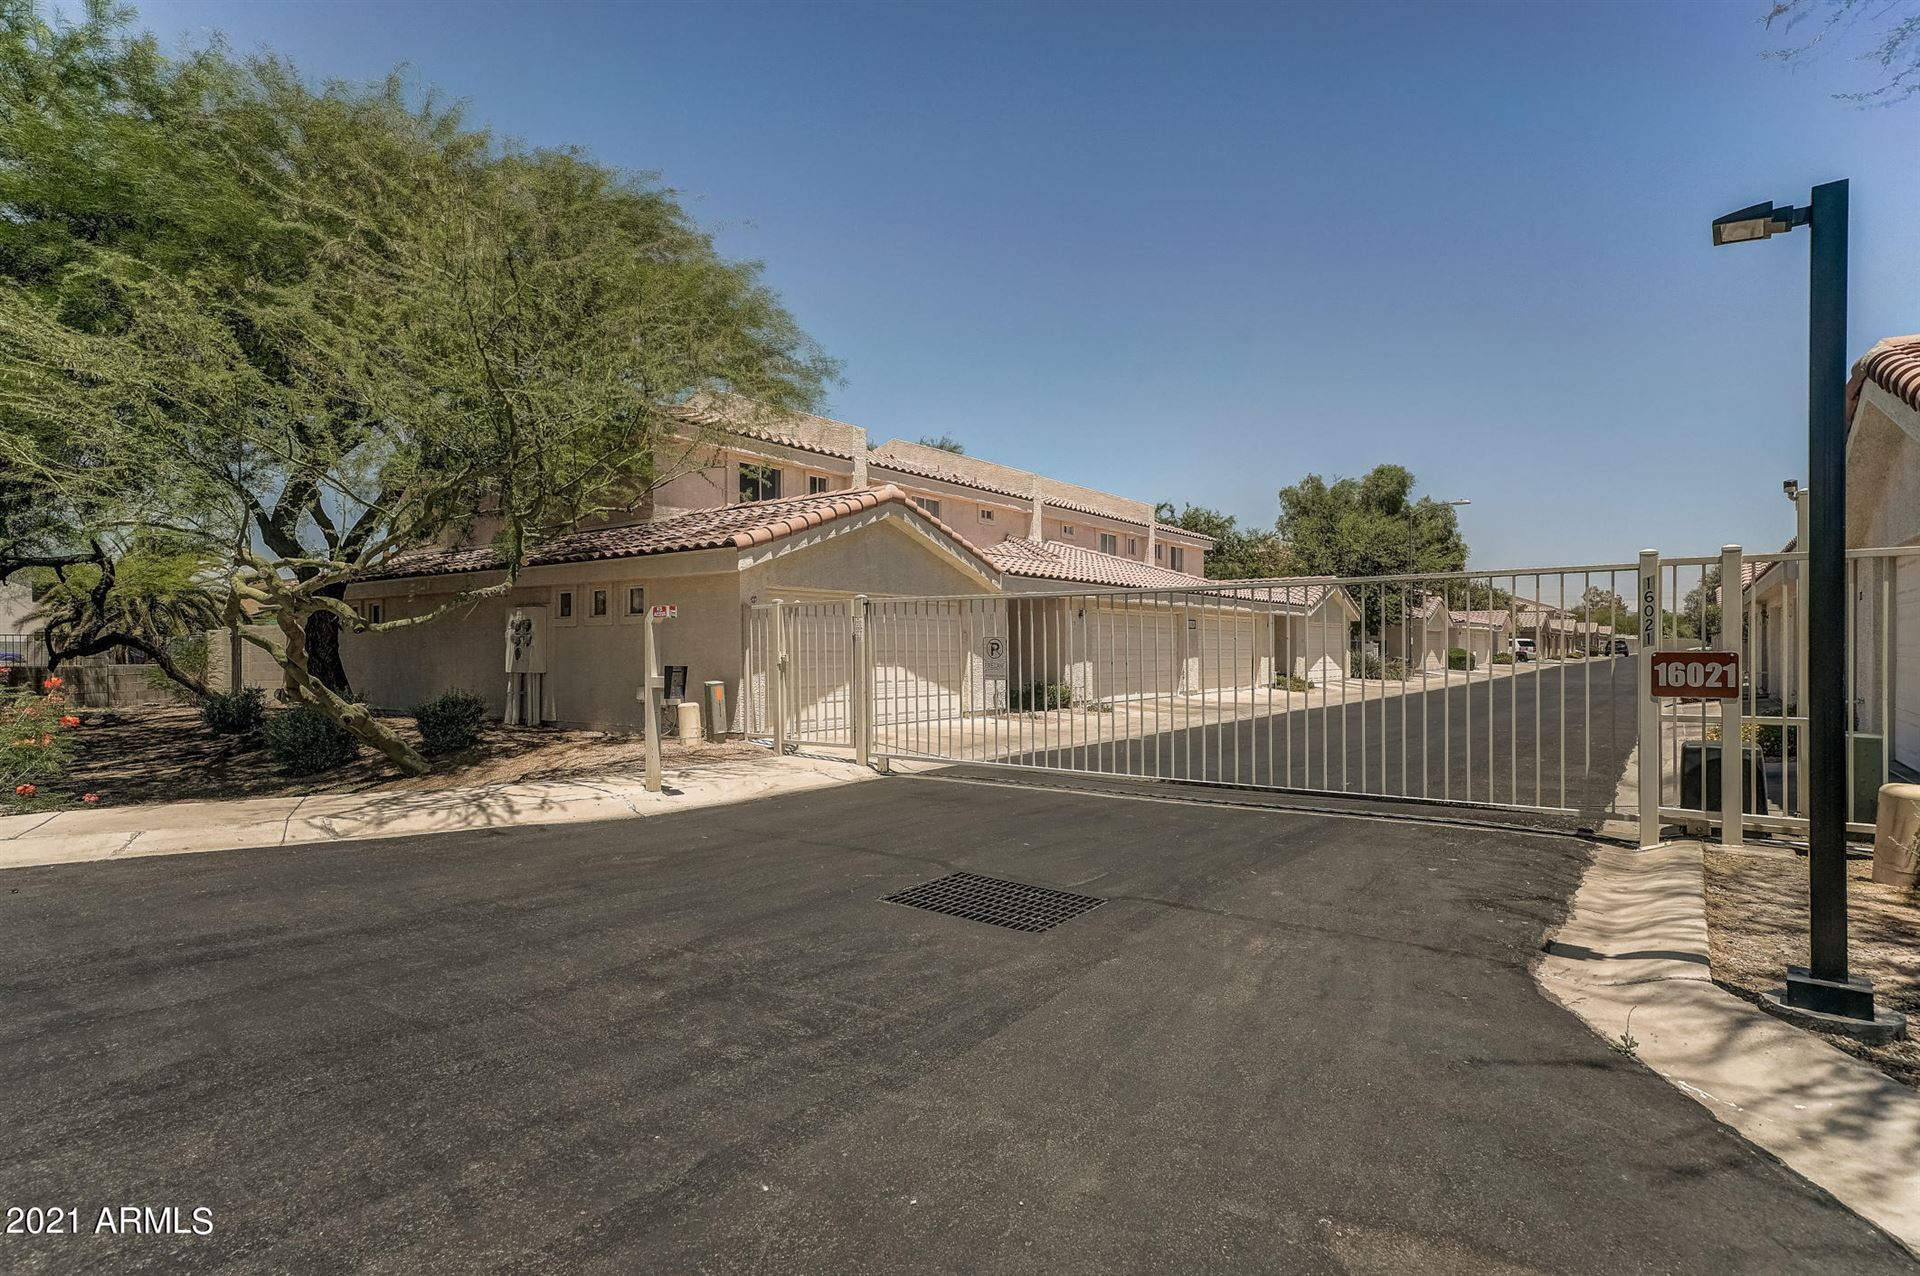 16021 N 30TH Street #116, Phoenix, AZ 85032 - MLS#: 6244557